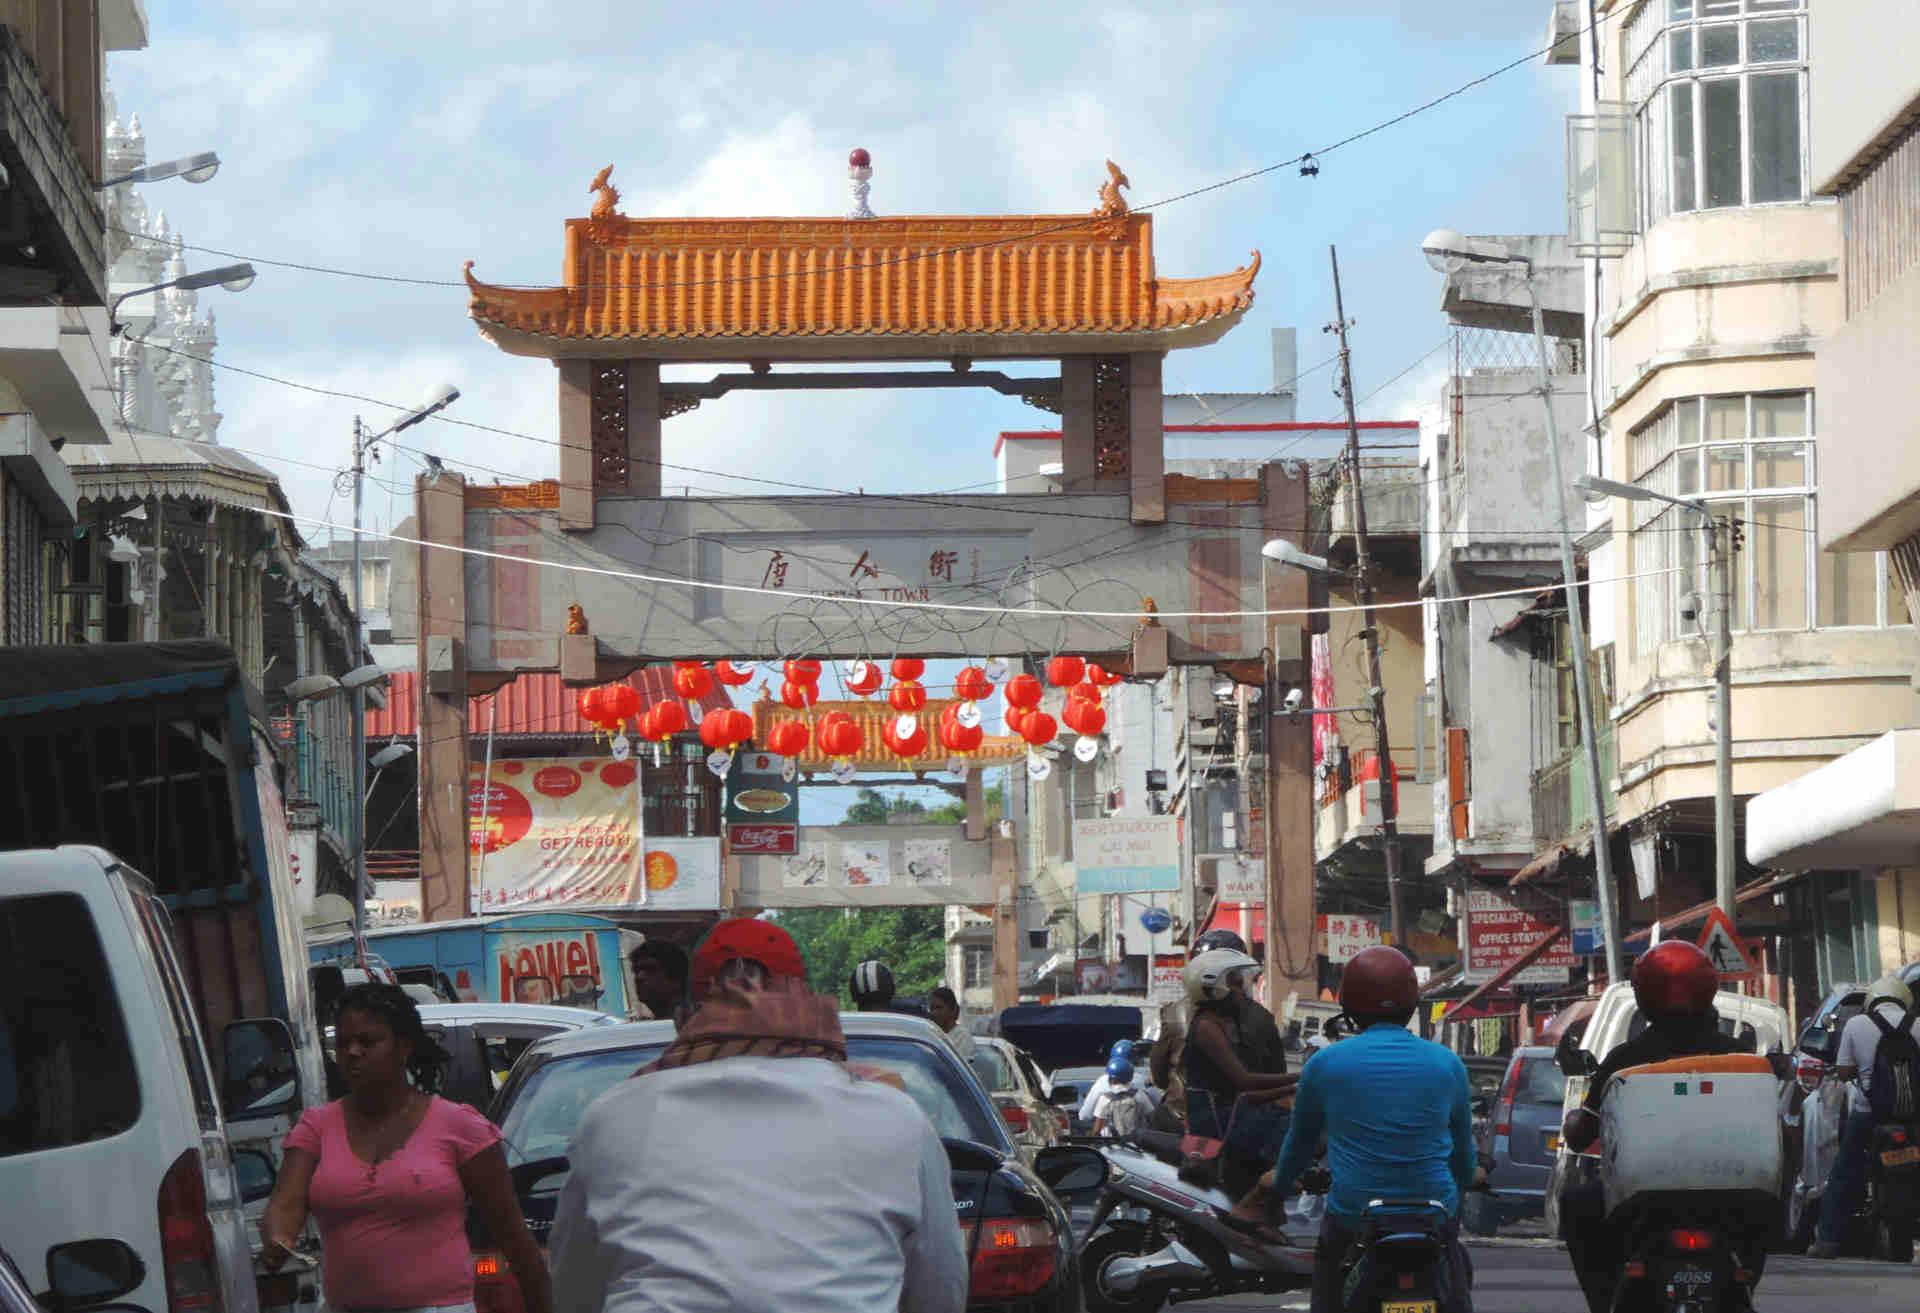 China-Stadt, Port Louis, Mauritius